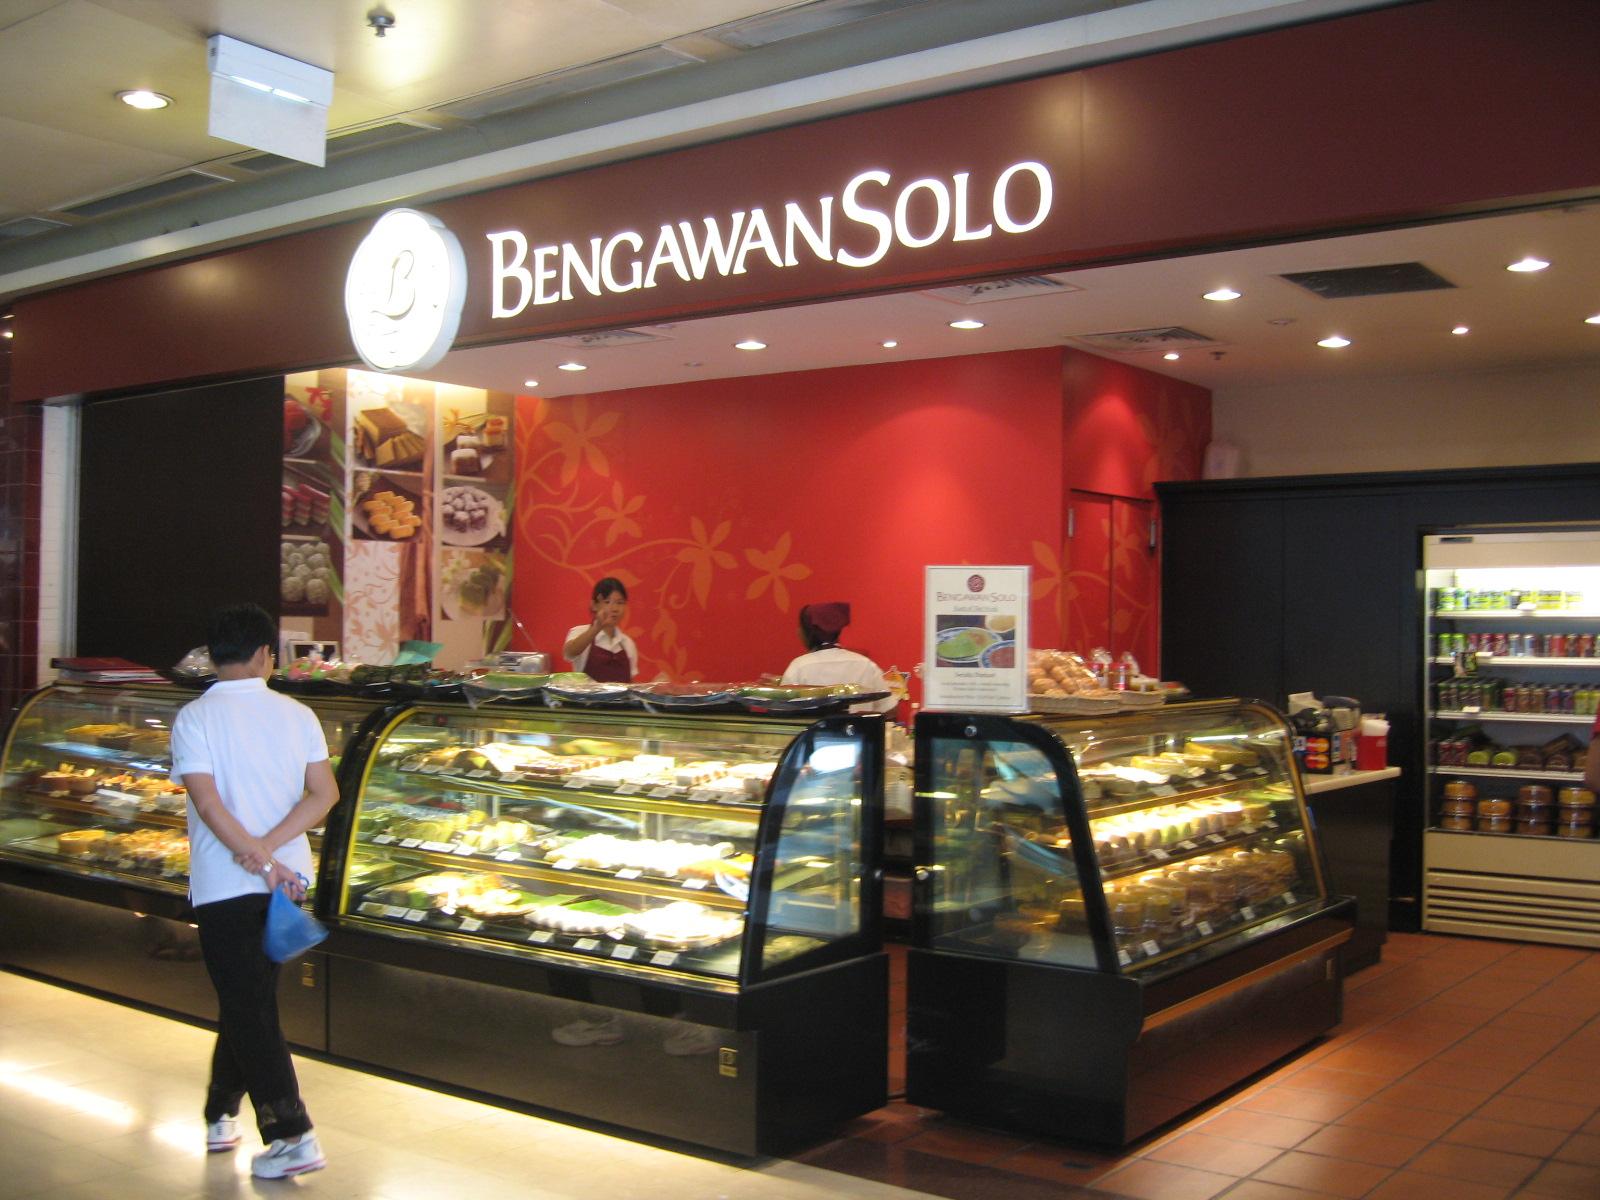 Bengawan Solo Singapore Birthday Cake